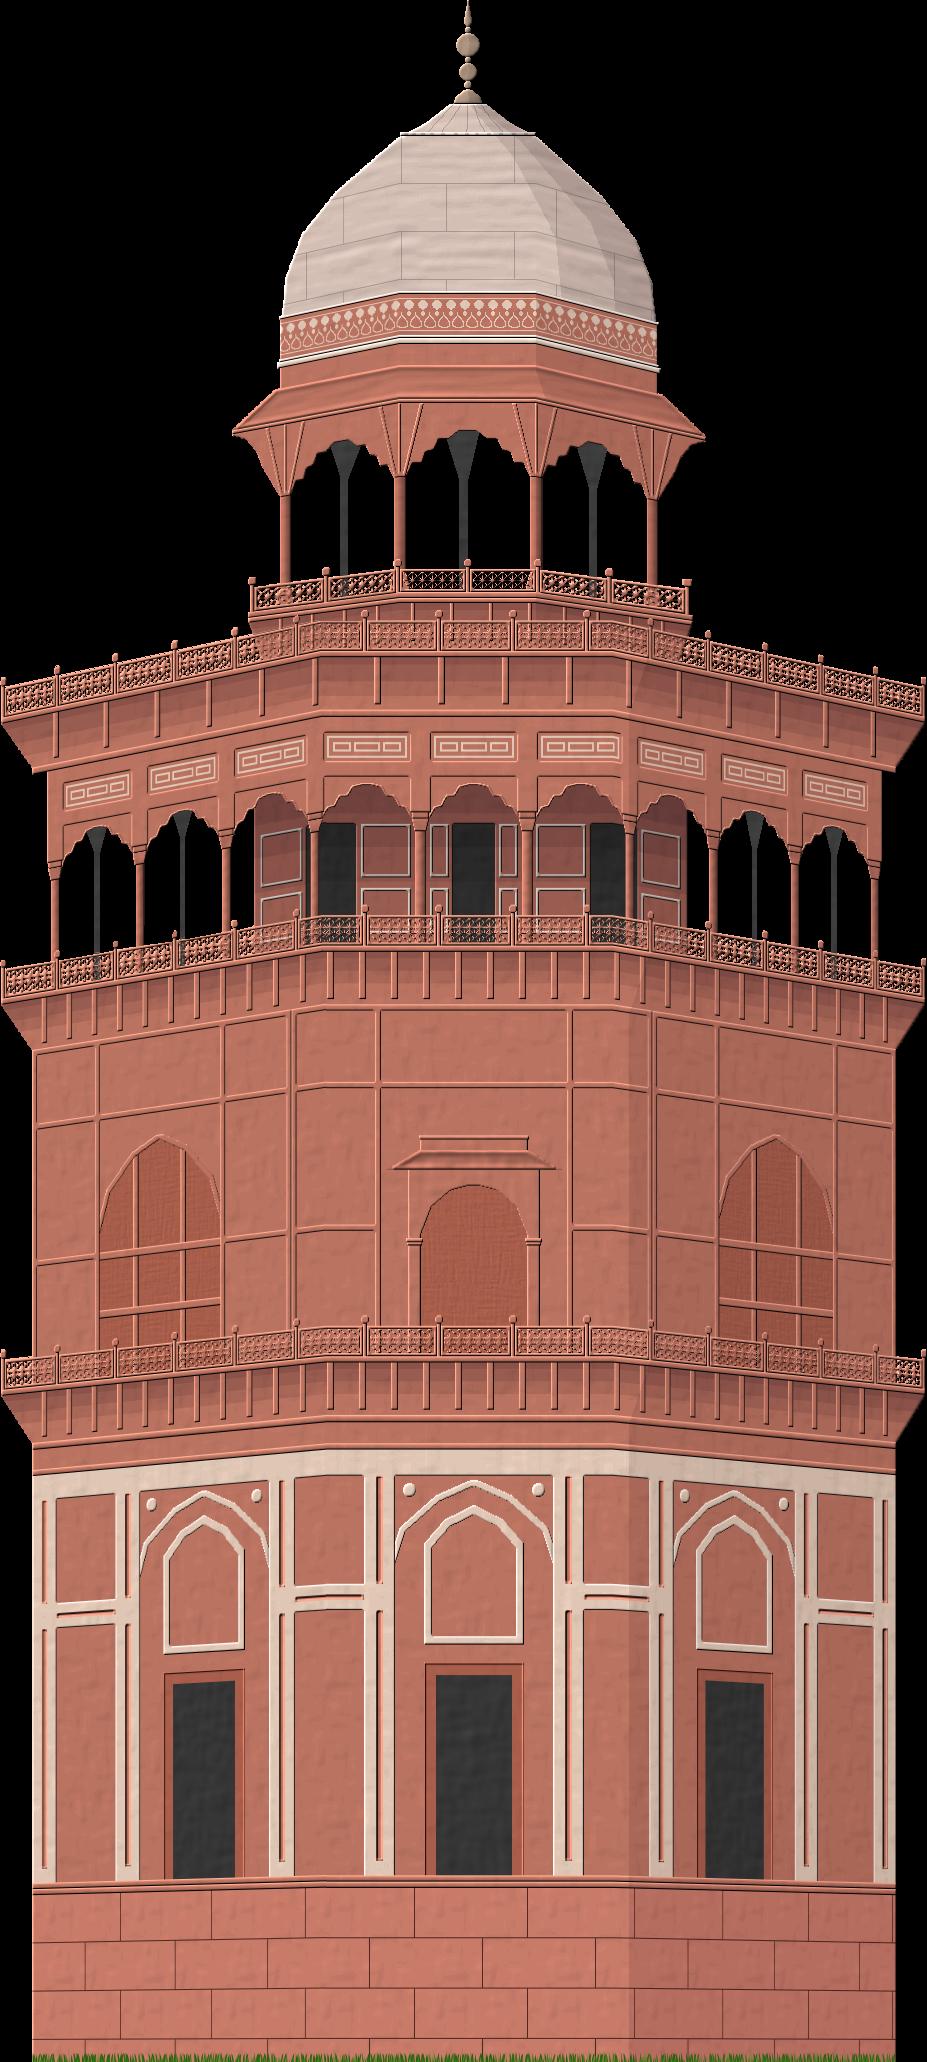 Tower clipart brick. Lidske stavby a domy